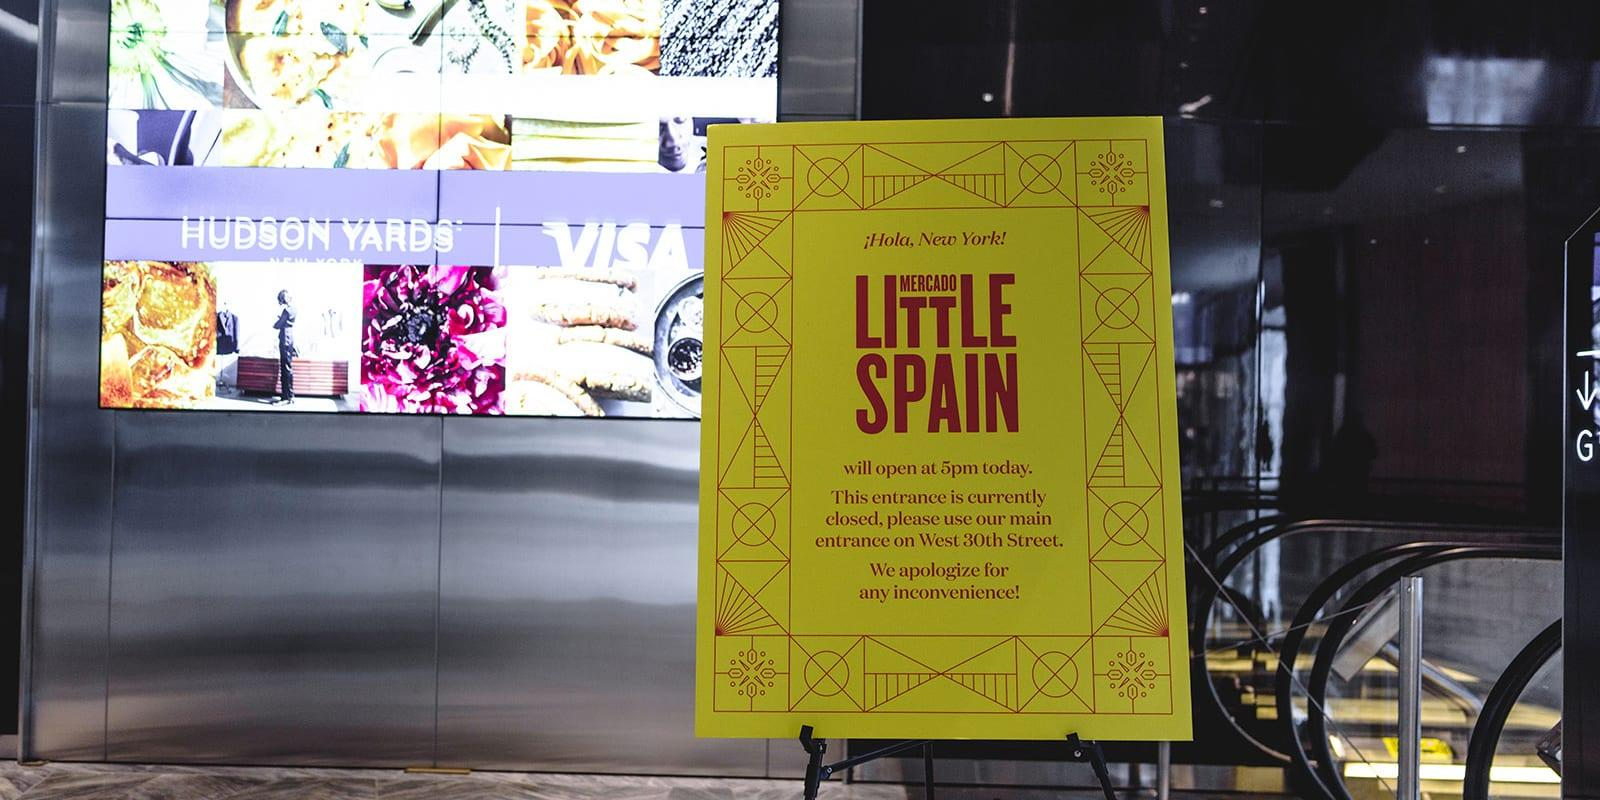 Mercado little spain sign